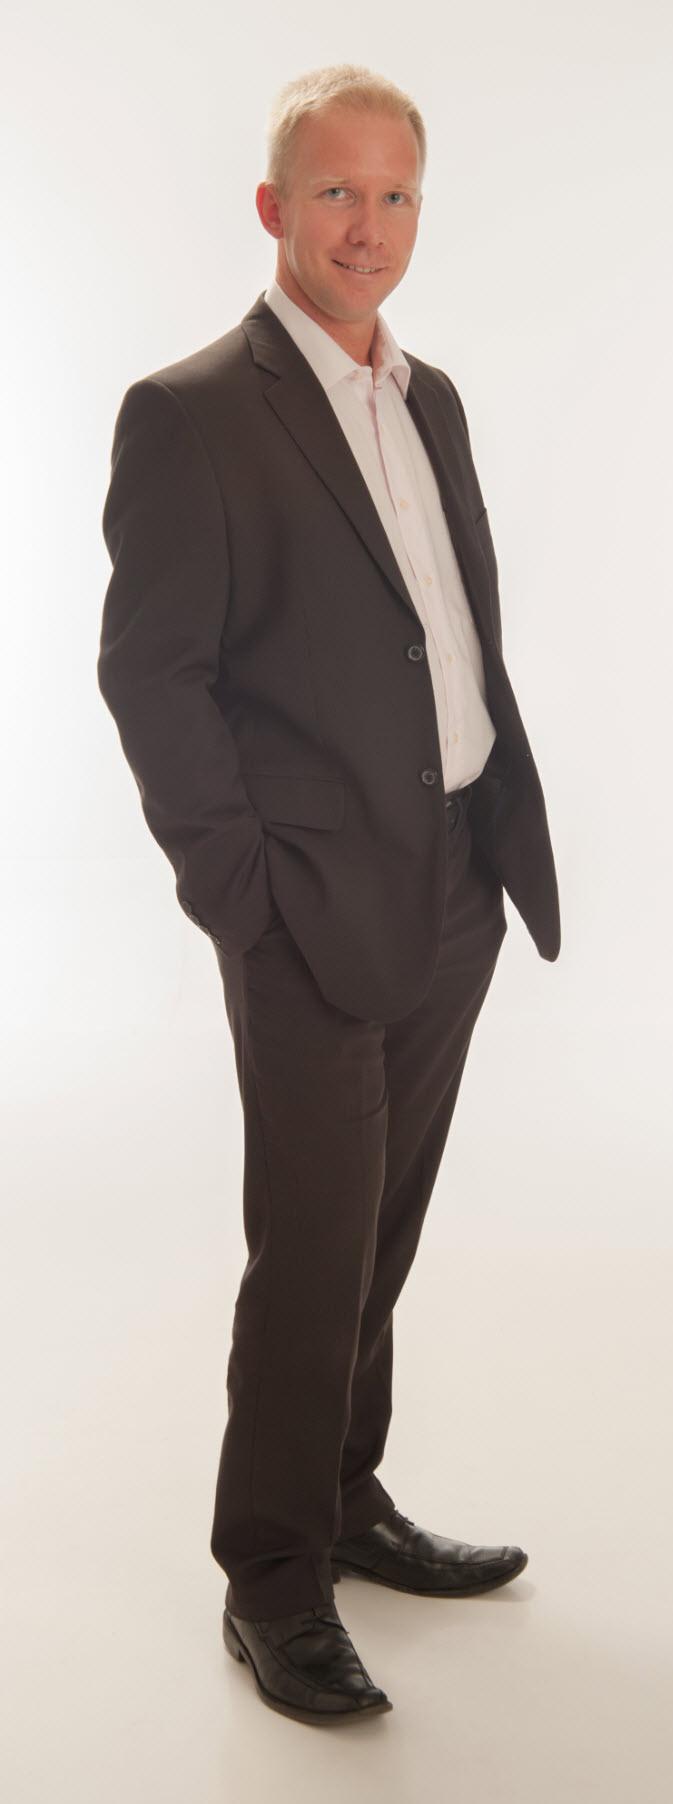 Tom Serroels - coach